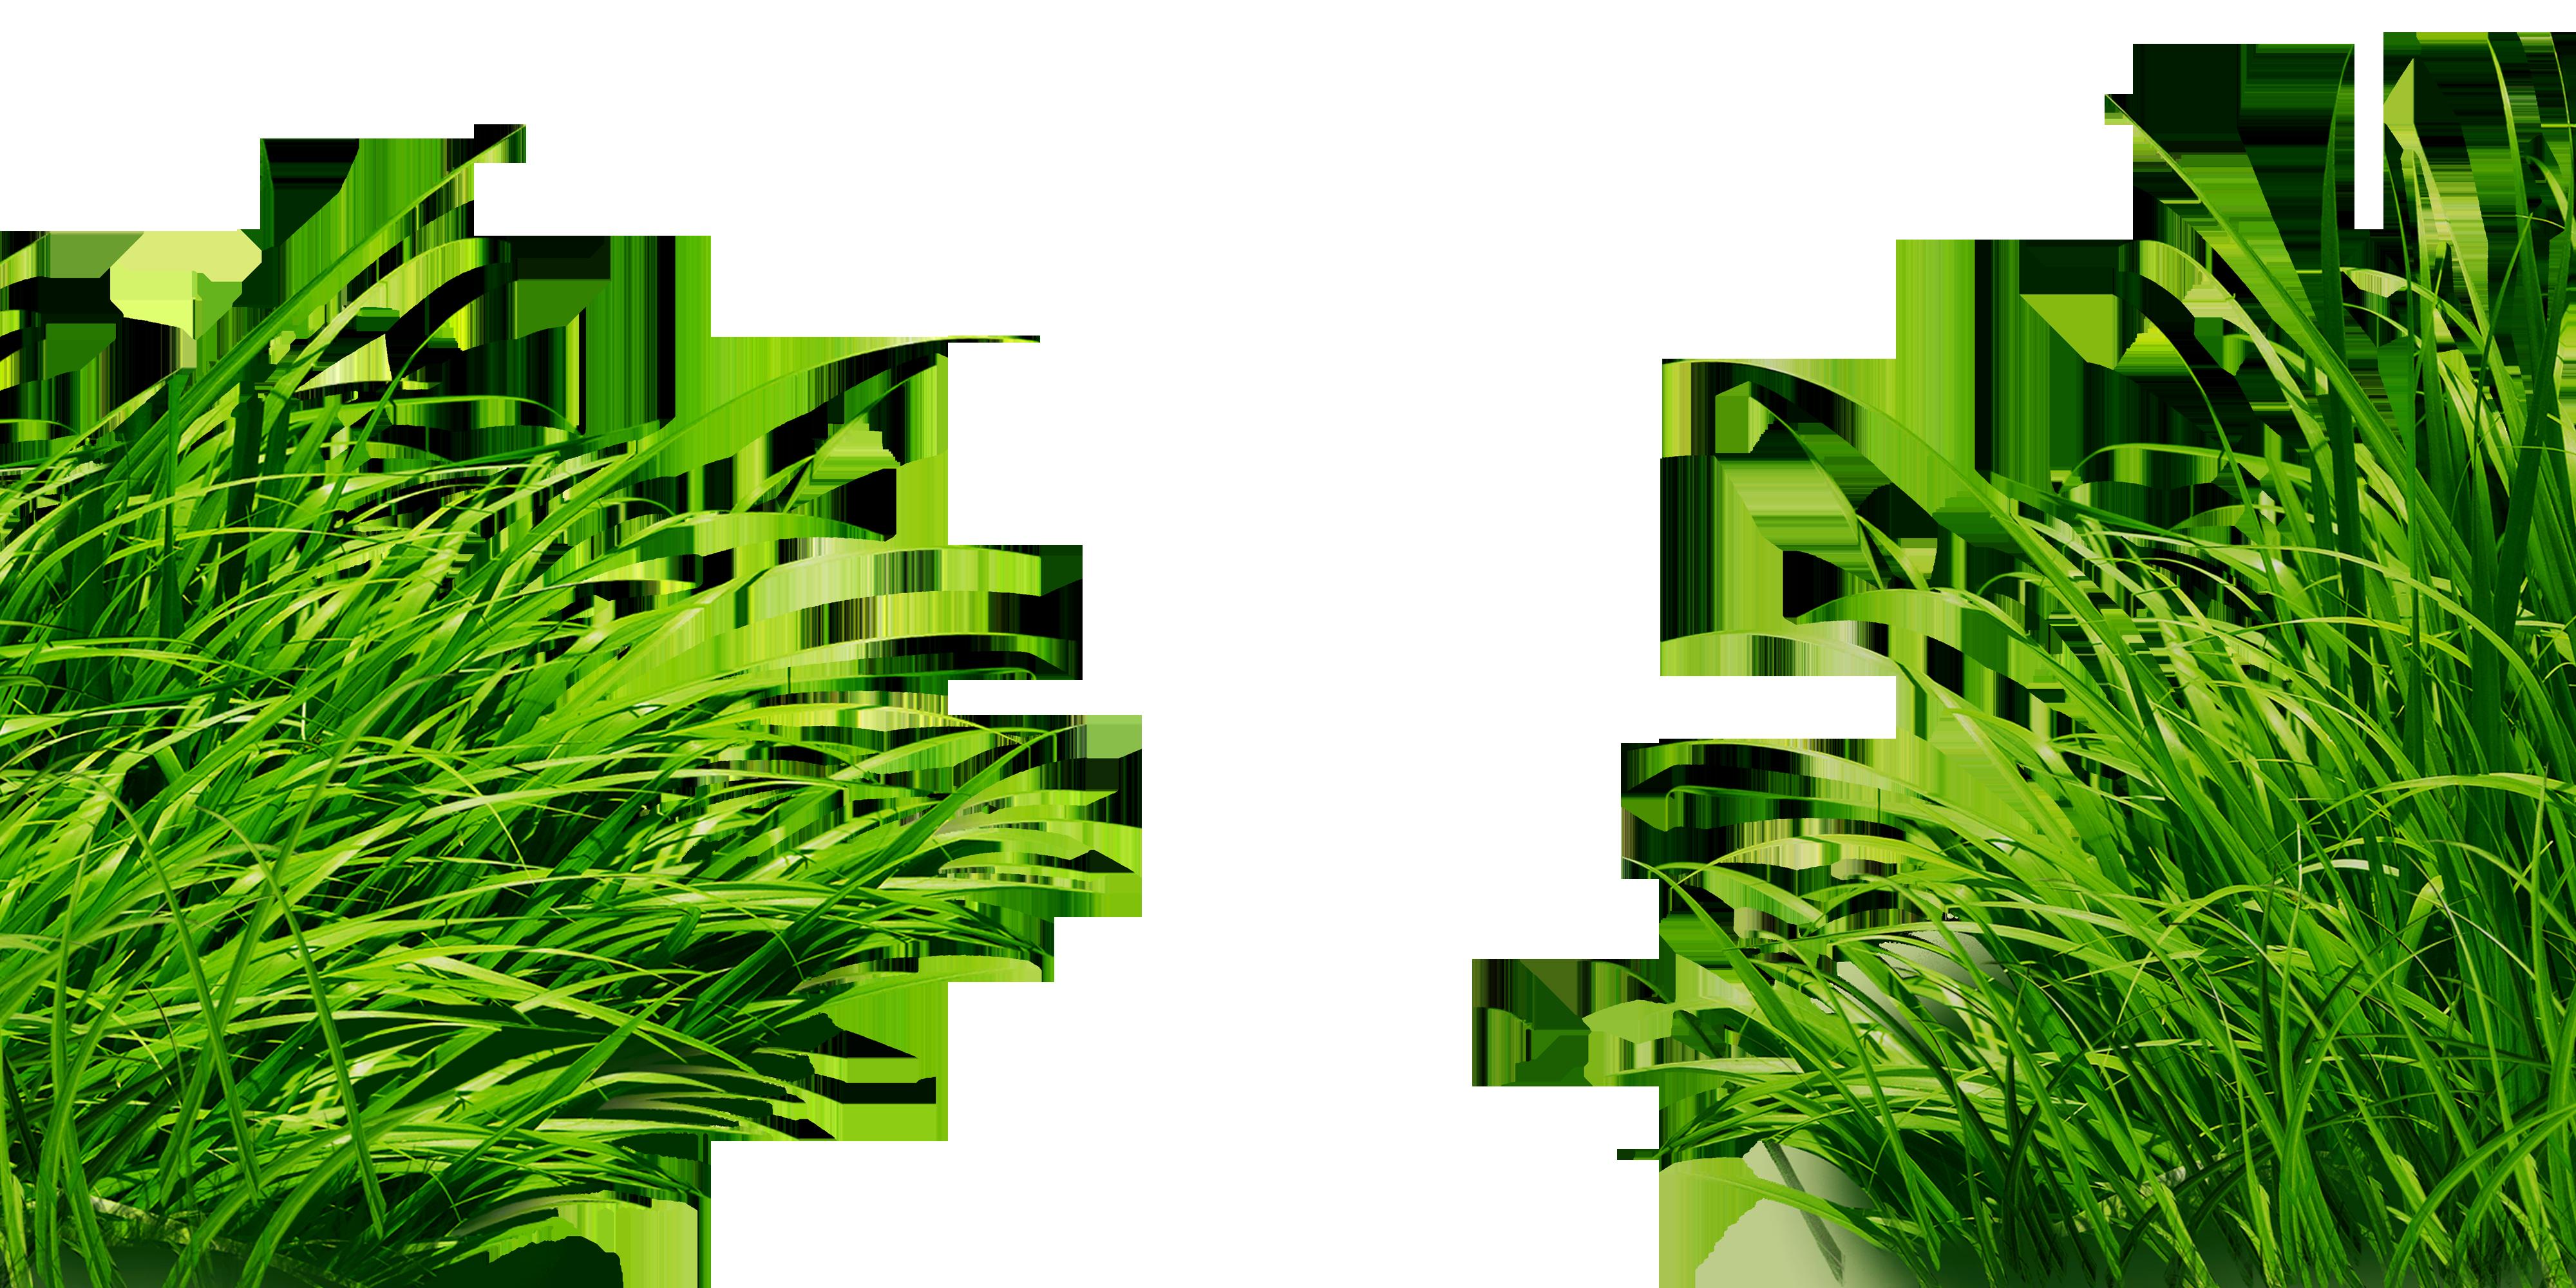 картинки без фона для презентаций зеленая трава потому, что дорога